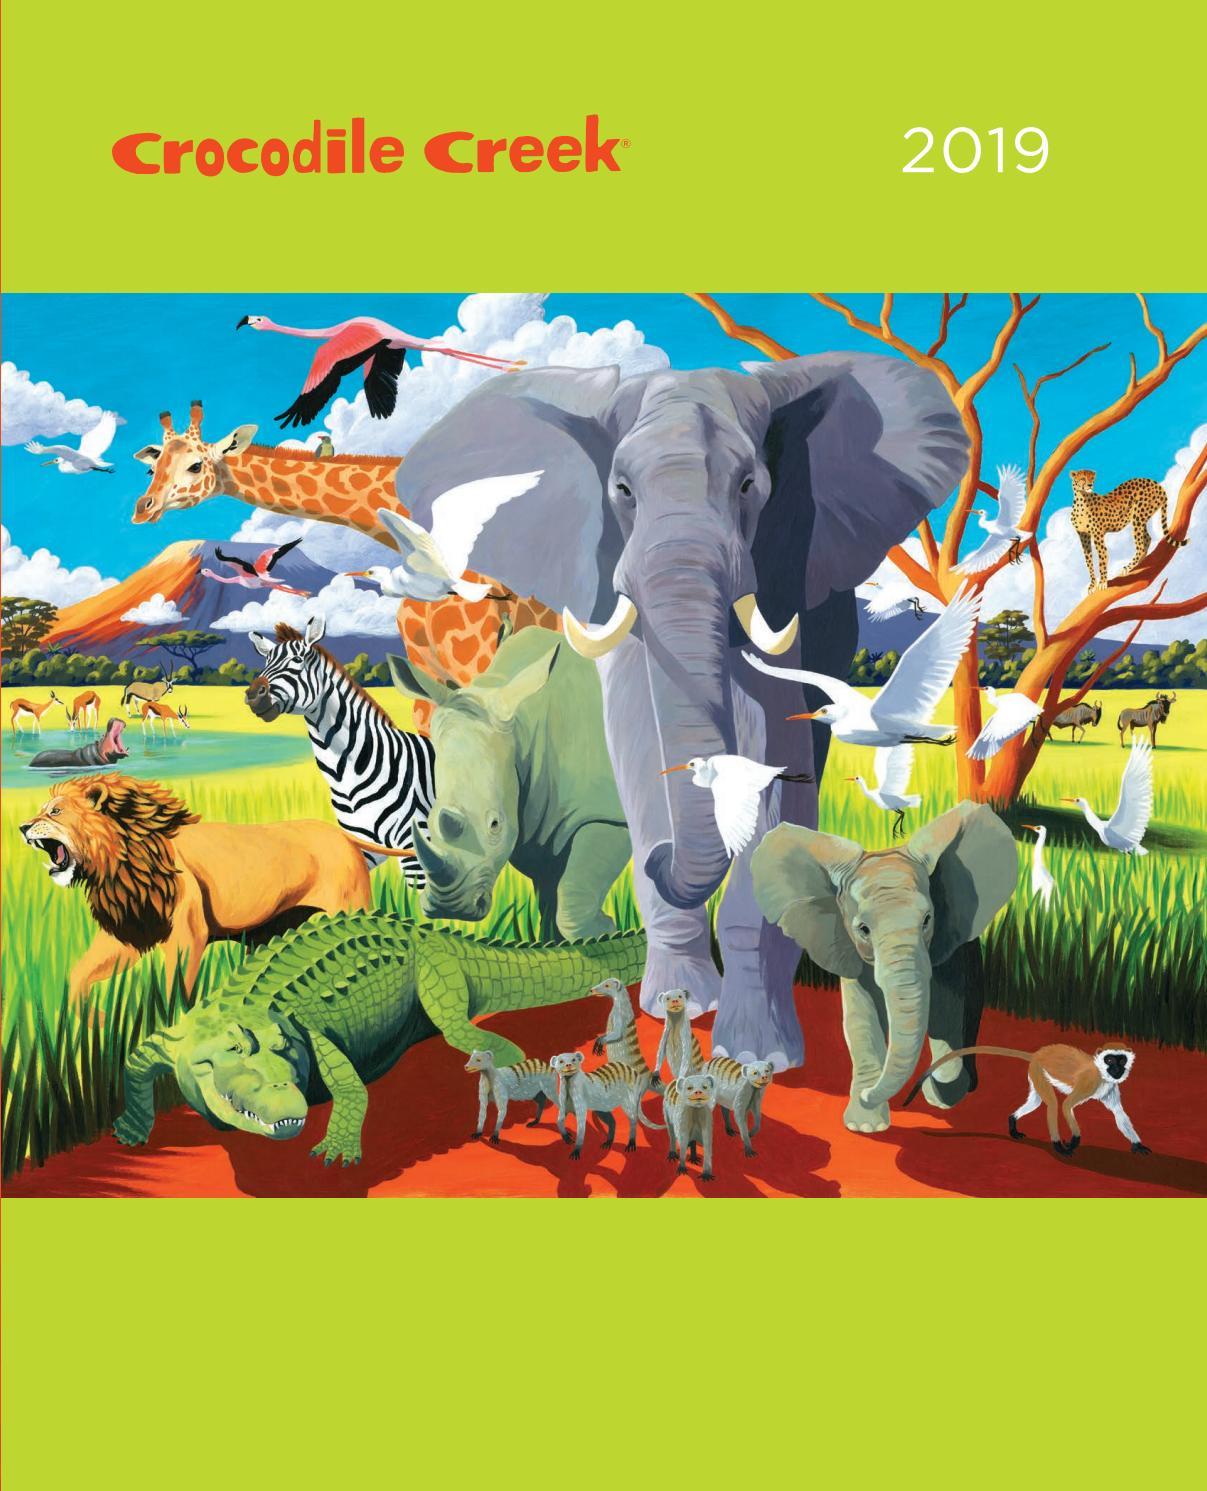 NEW Crocodile Creek Whimsy Bib For Kids